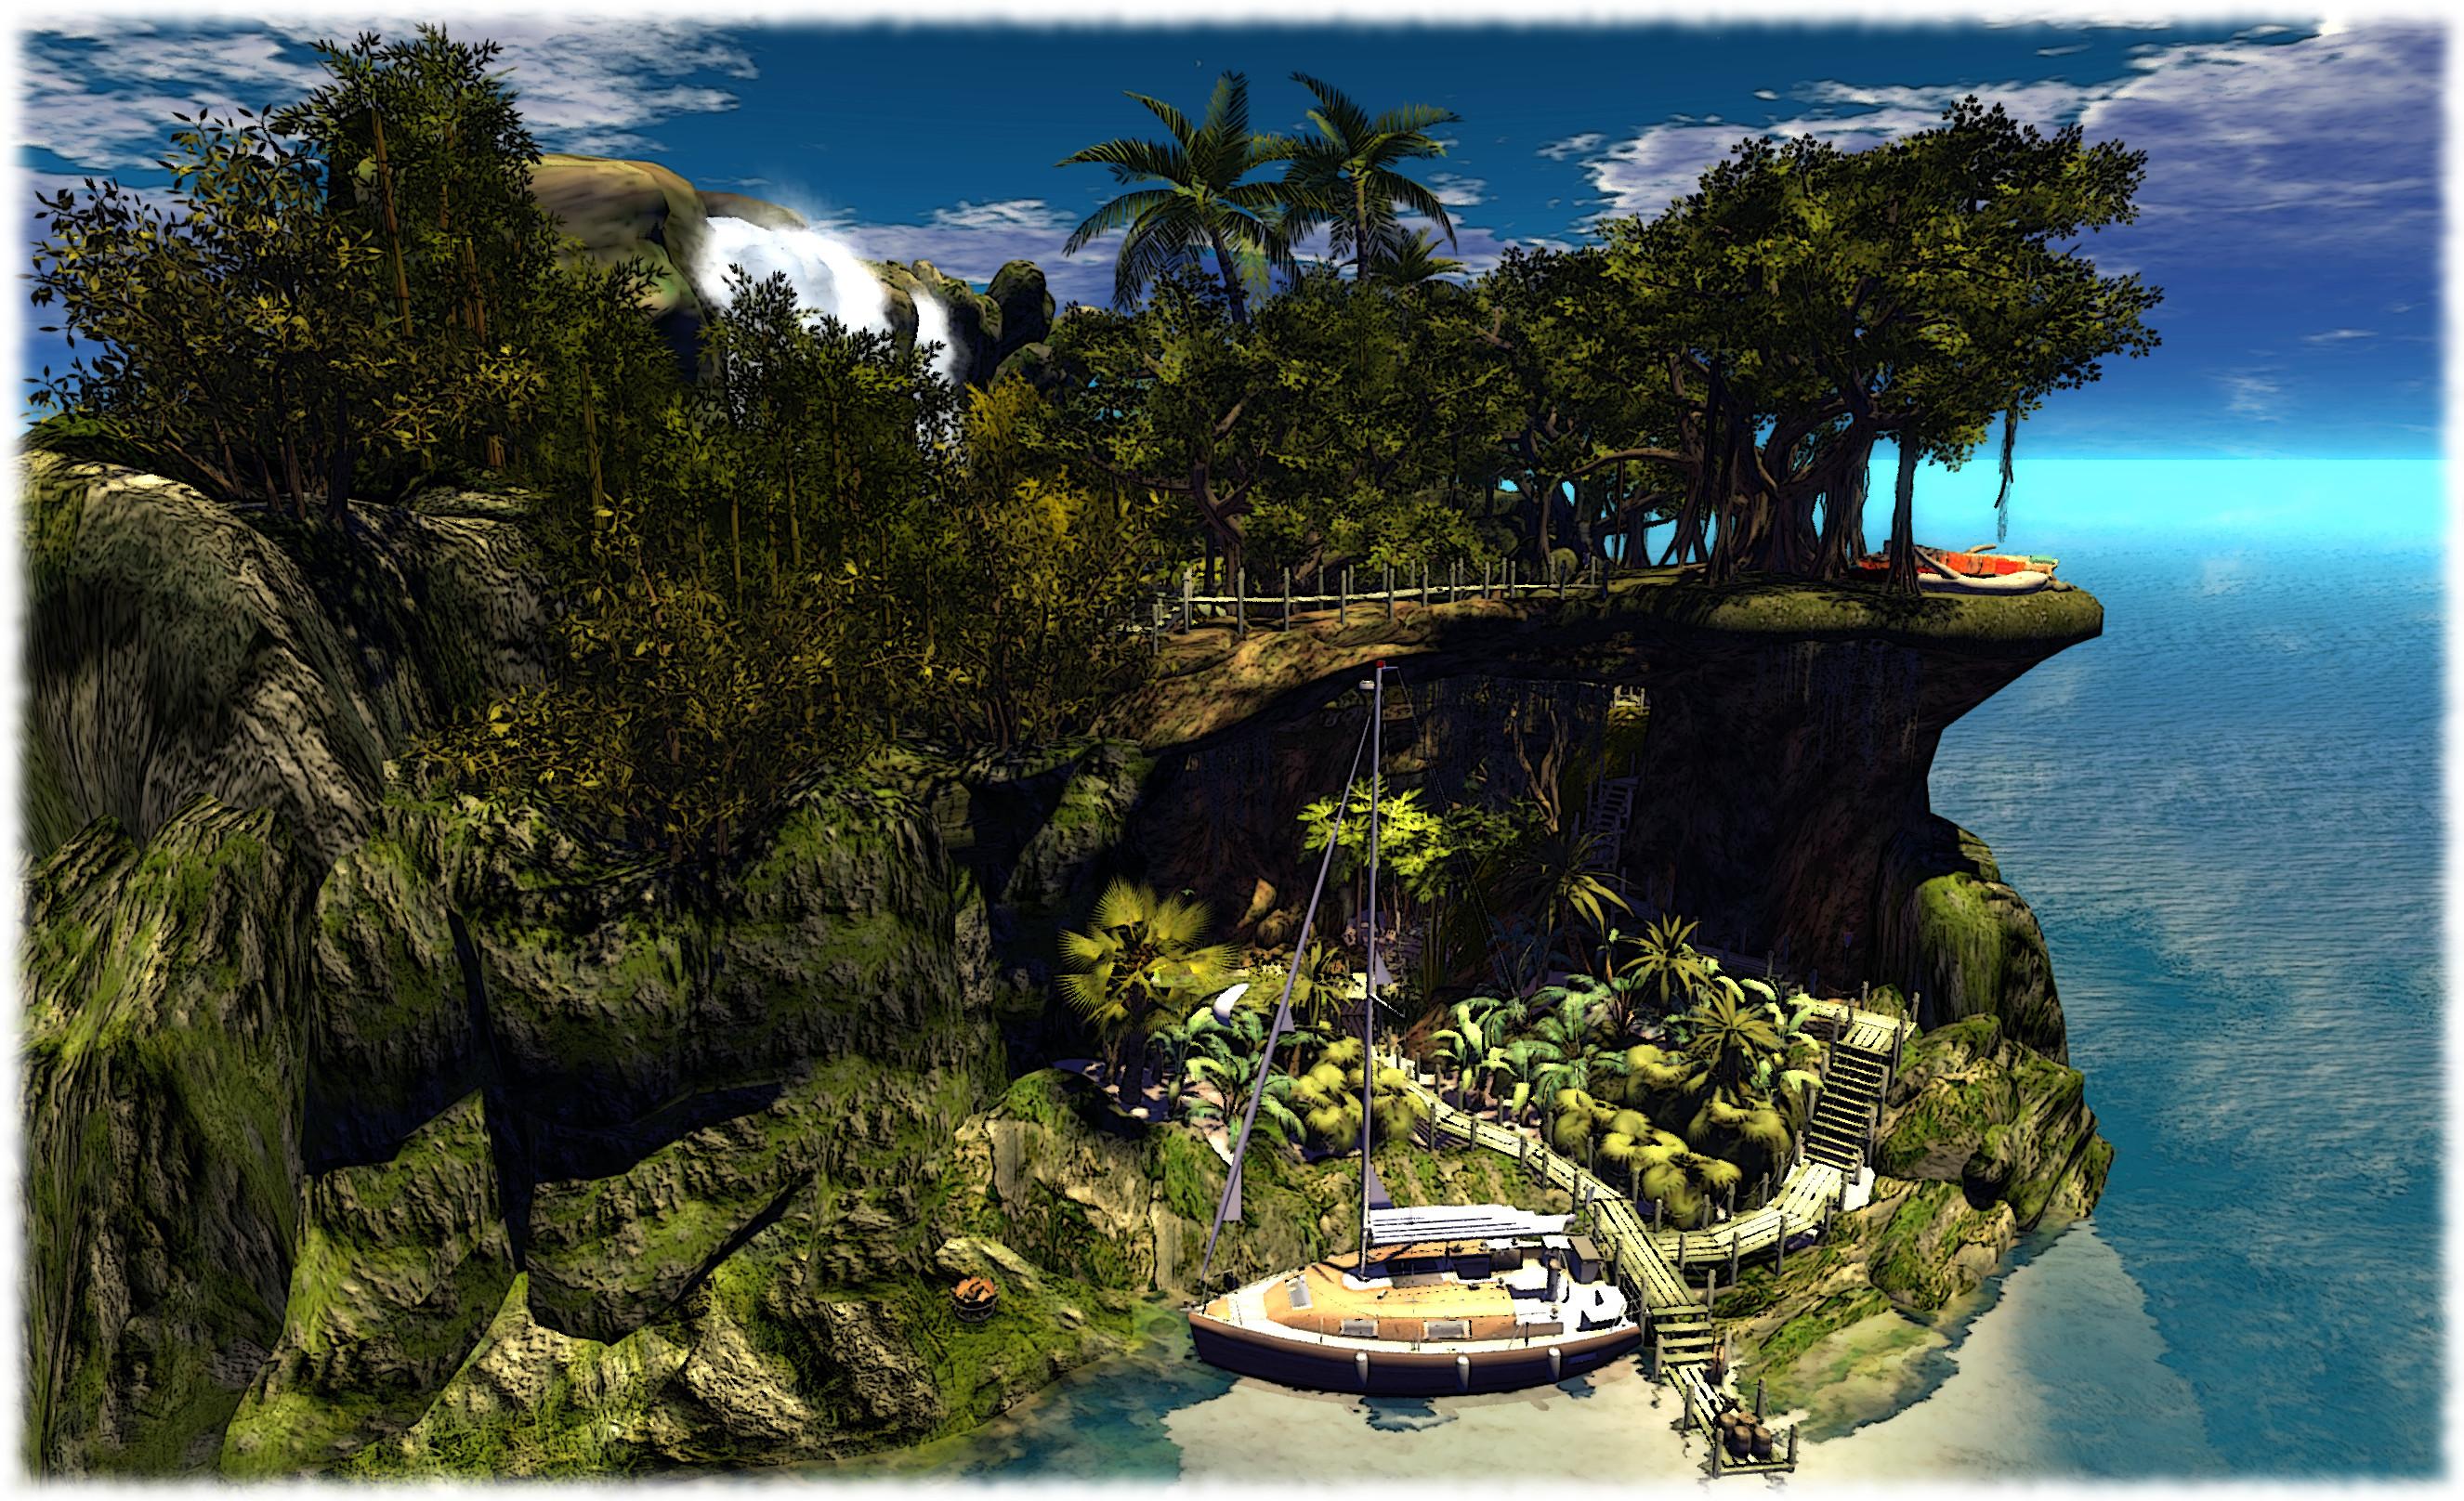 The Compact Beauty Of The Garden Of Eden Inara Pey